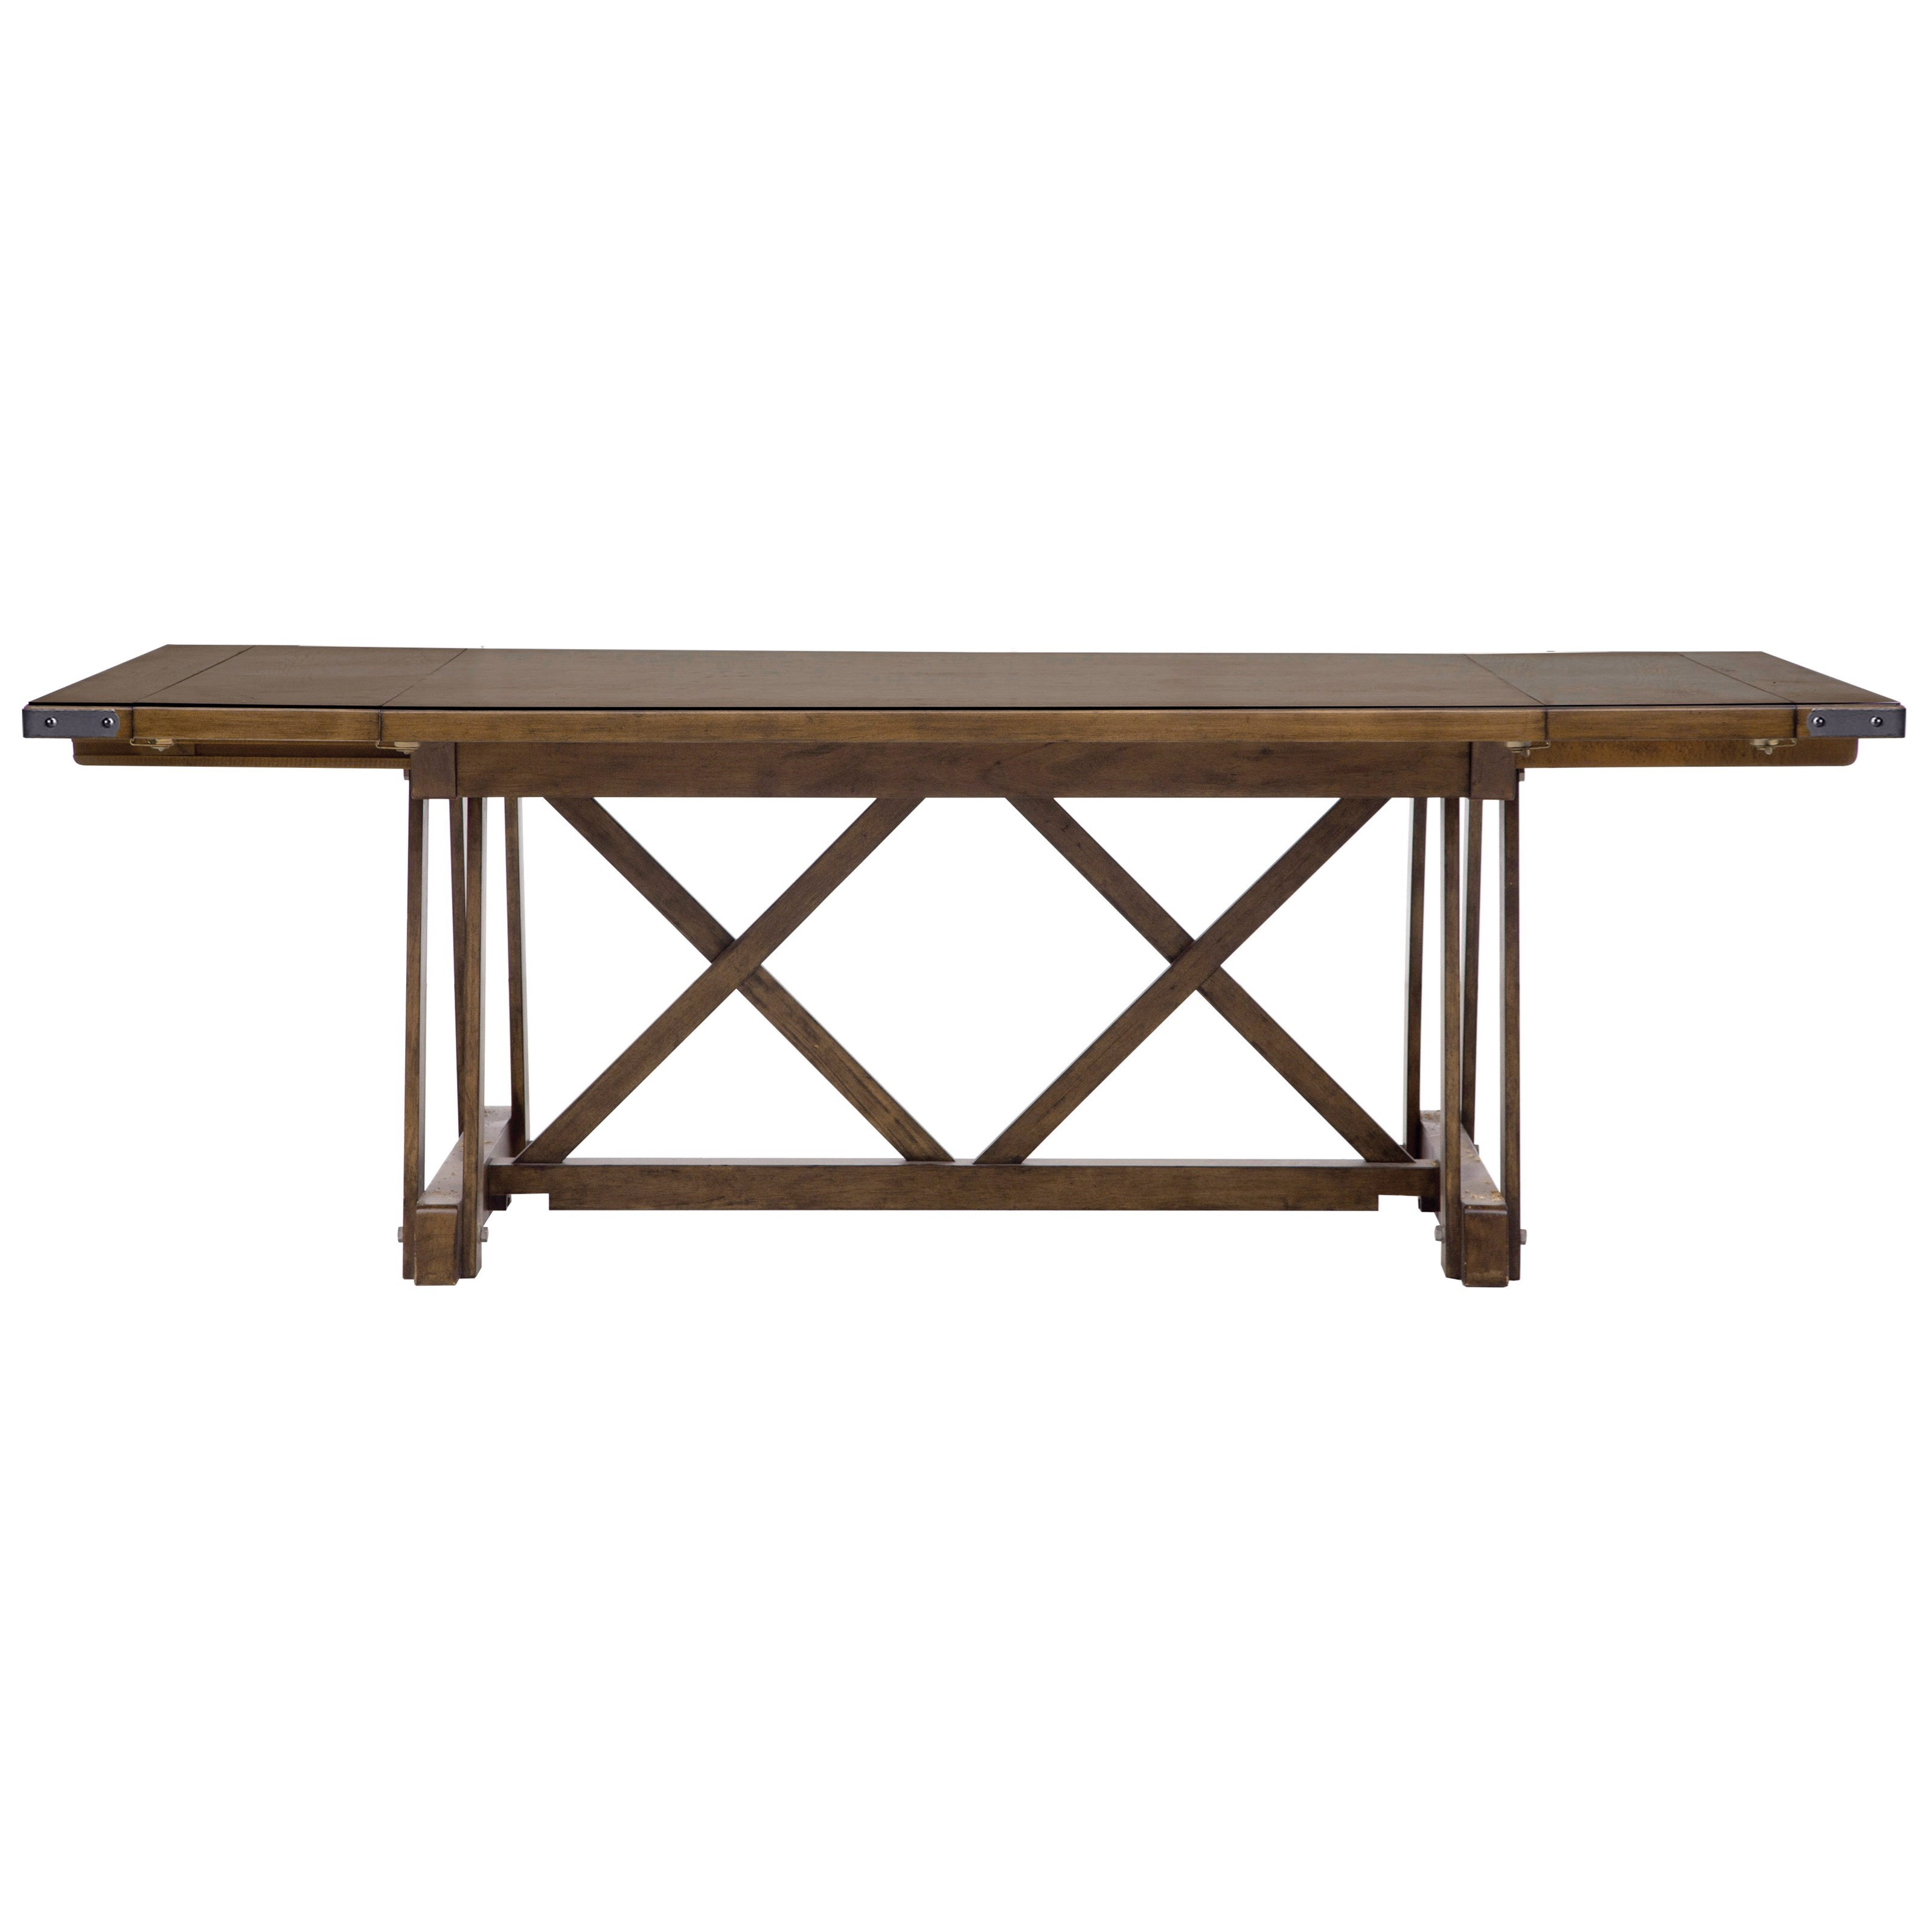 Pulaski Furniture Weston Loft Rectangular Dining Table  : products2Fpulaskifurniture2Fcolor2Fweston20loft20p001p0012402B1 b1 from www.boulevardhomefurnishings.com size 3200 x 3200 jpeg 425kB